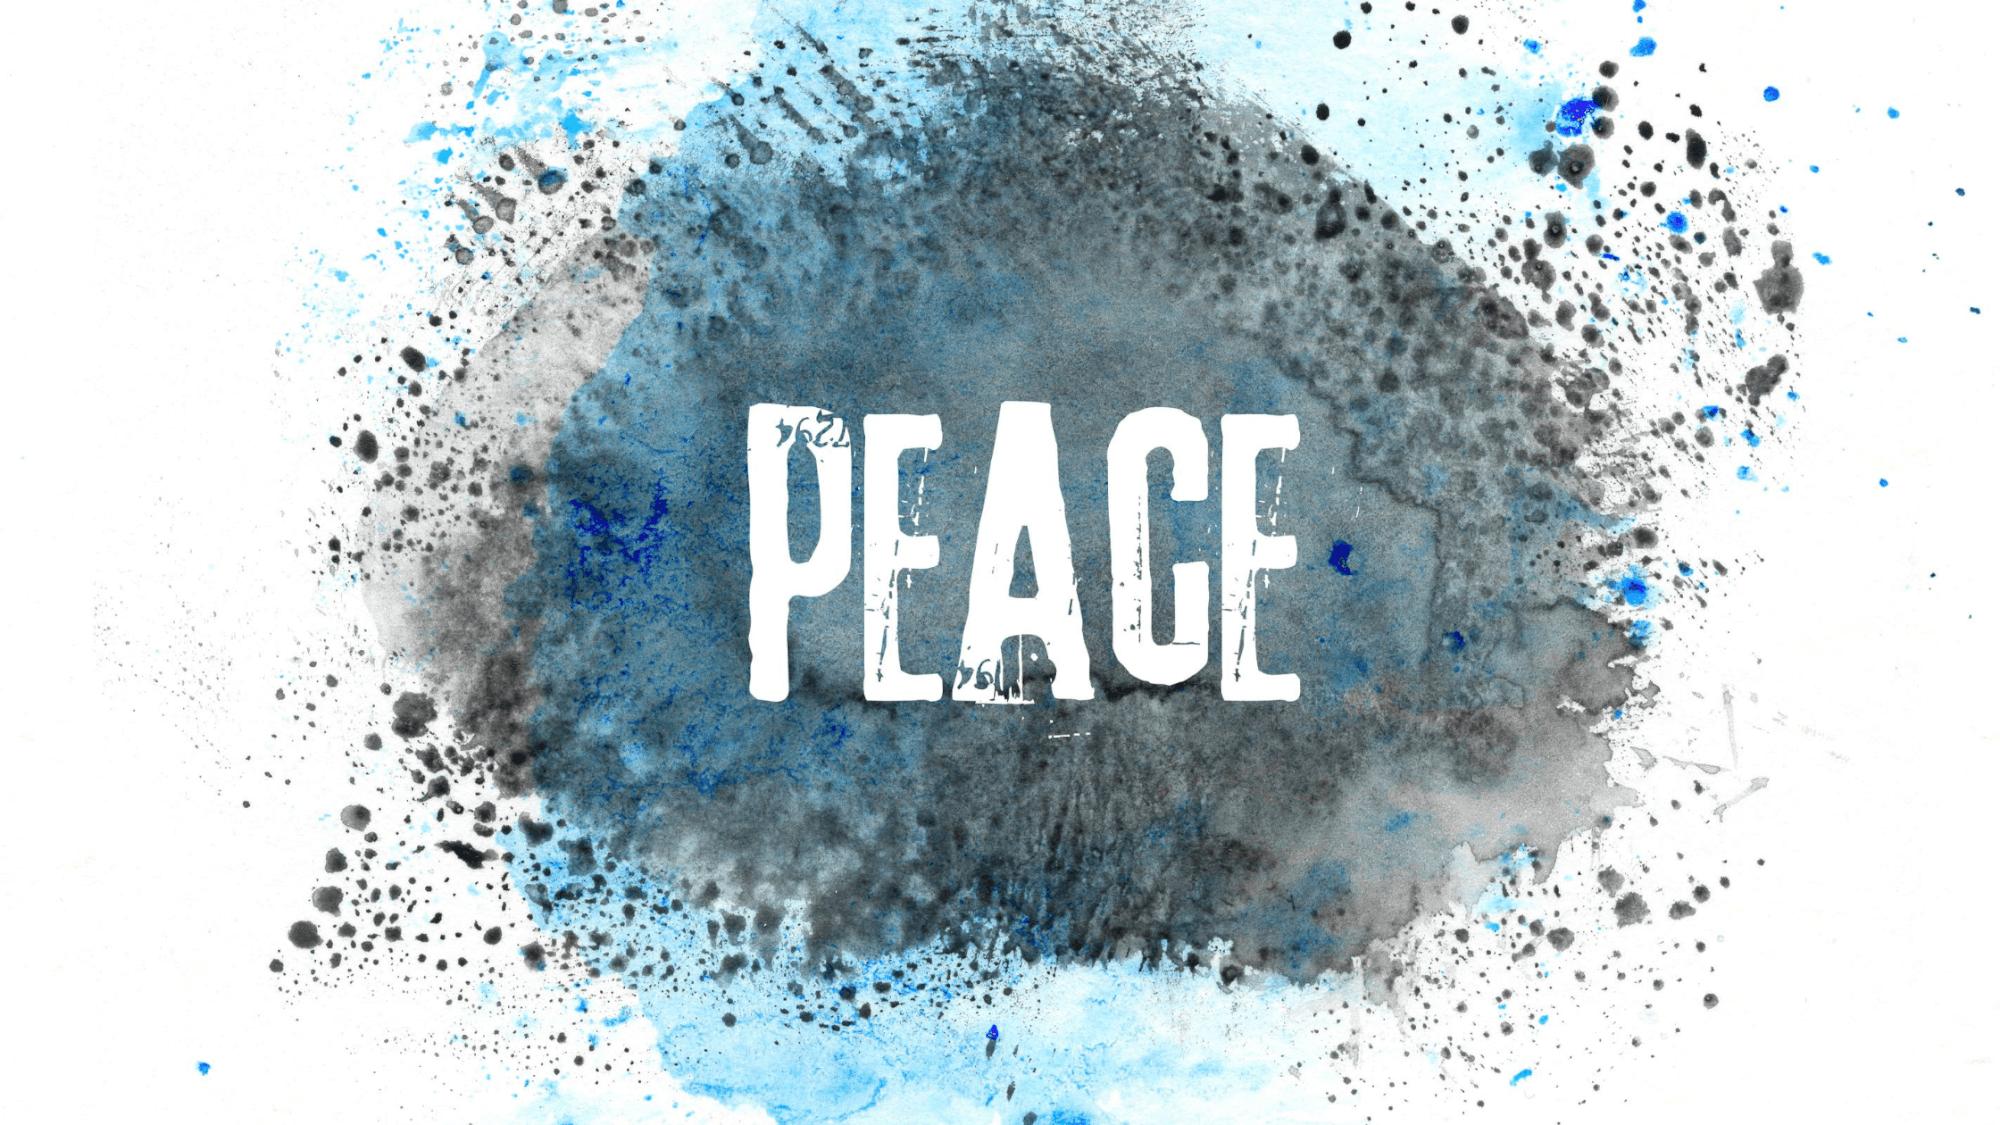 Words Peace-pursuing peace